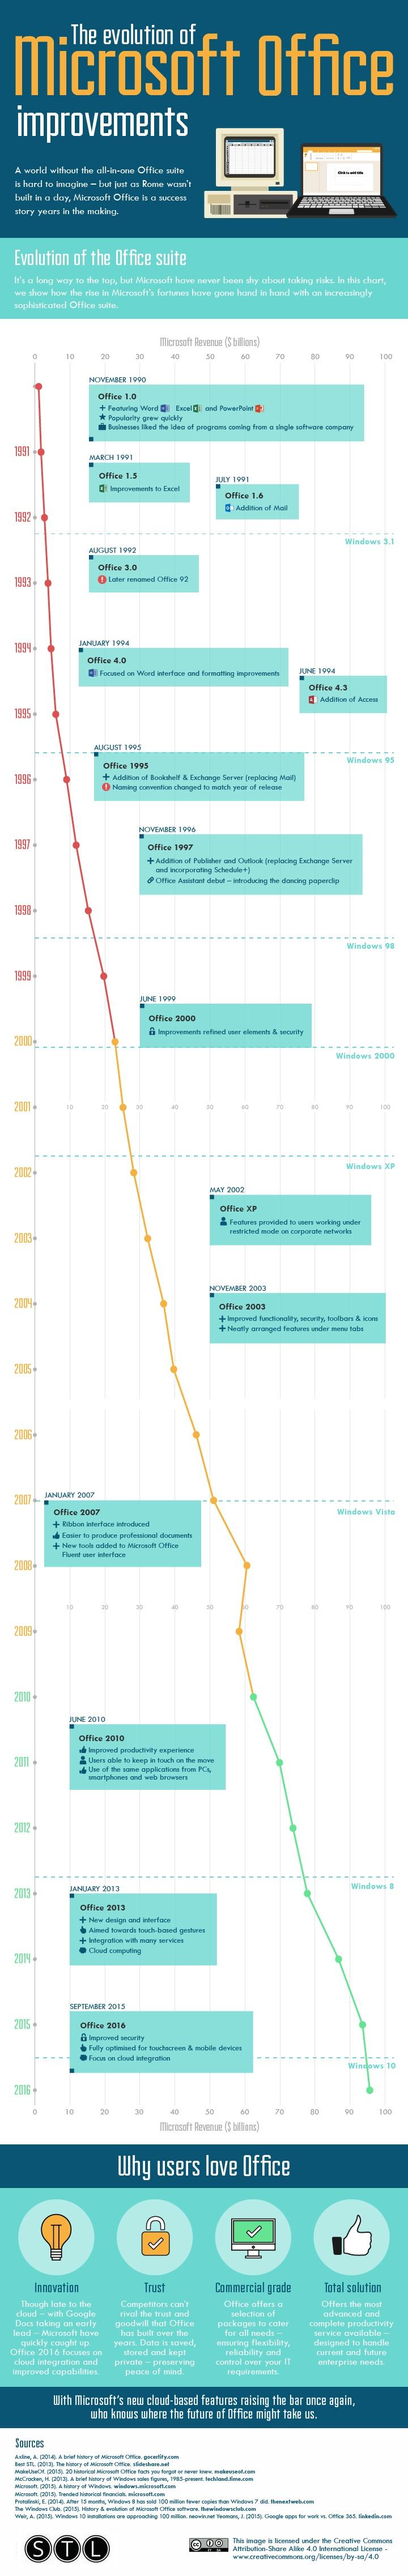 microsoft-office-evolution